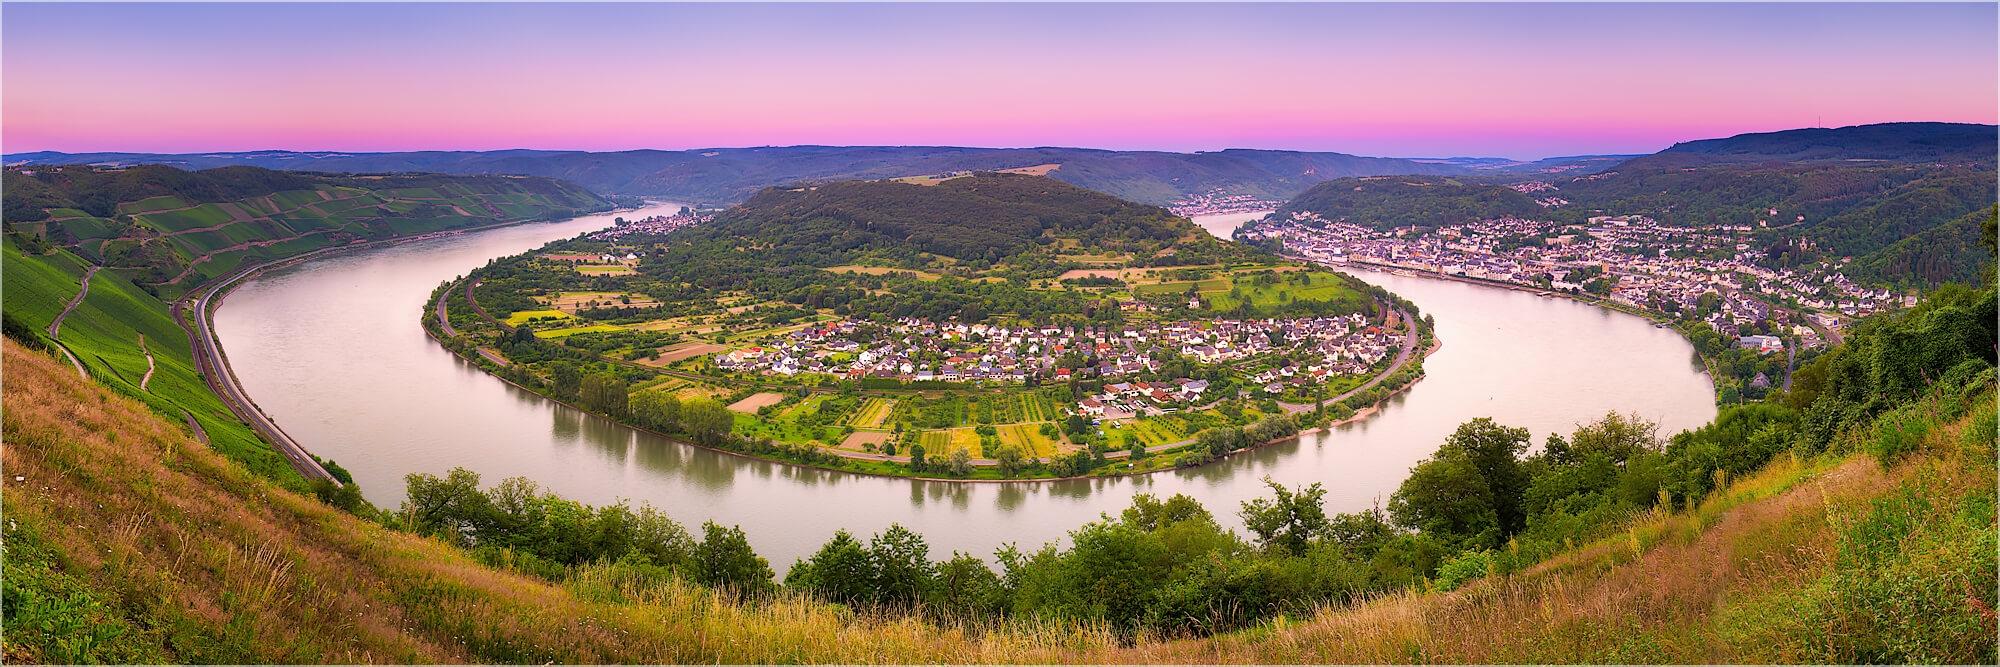 Panoramafoto Rheinschleife bei Boppard